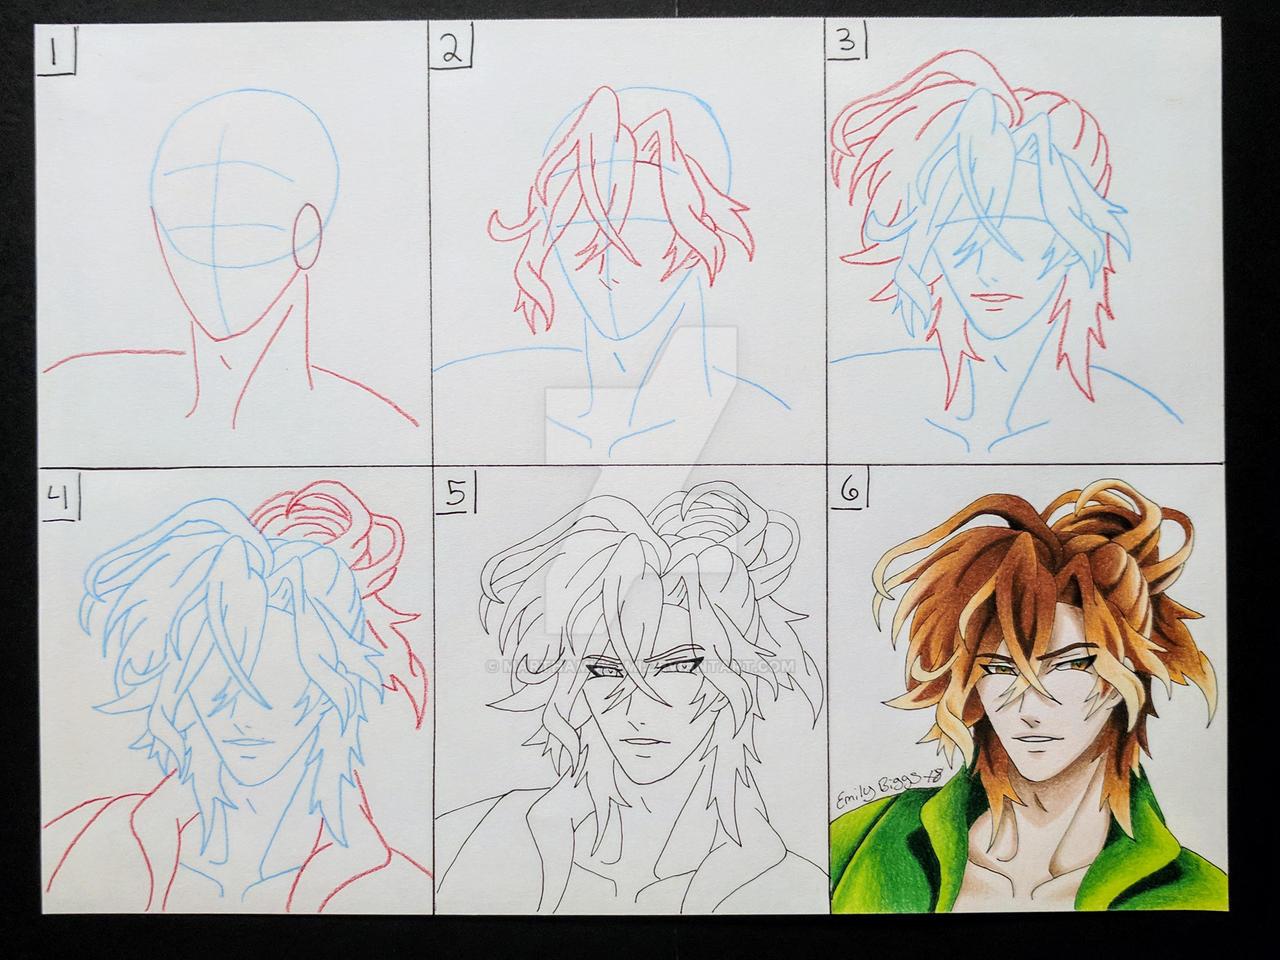 Drawing Tutorial: Learn to Draw Yuma Mukami by MarthaMukami